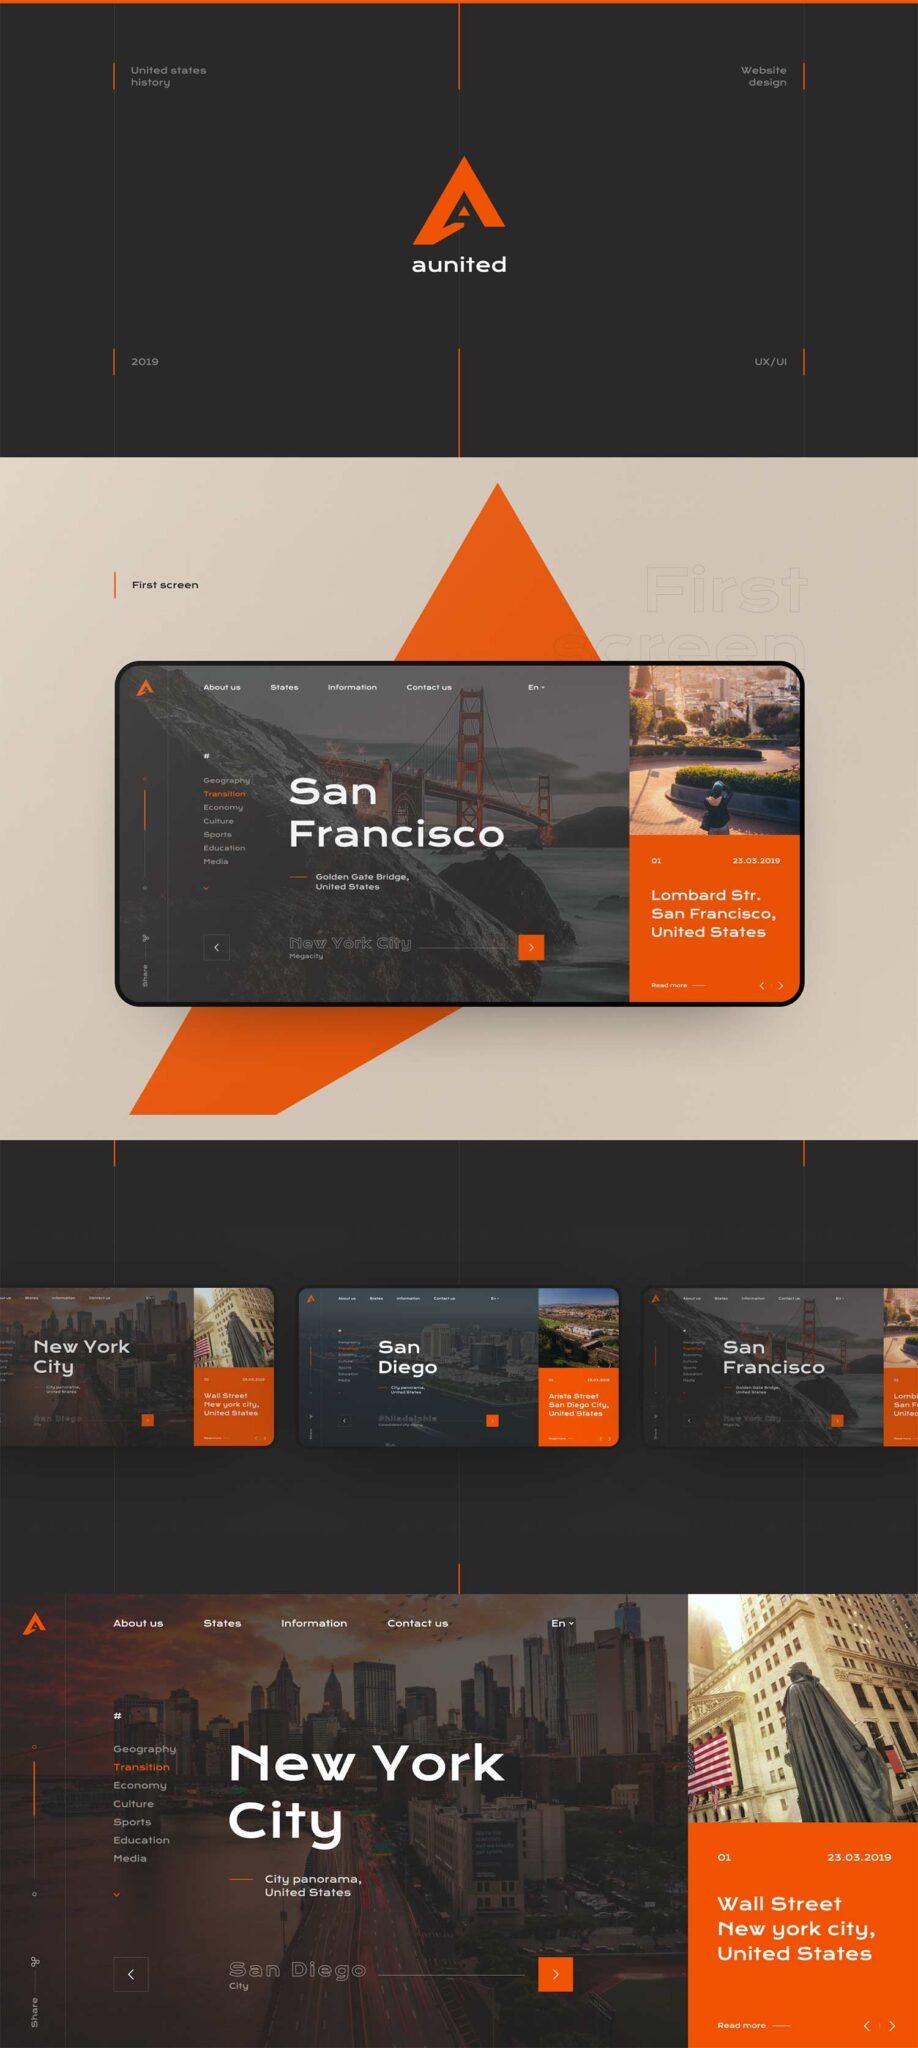 webdesign-inspiration-